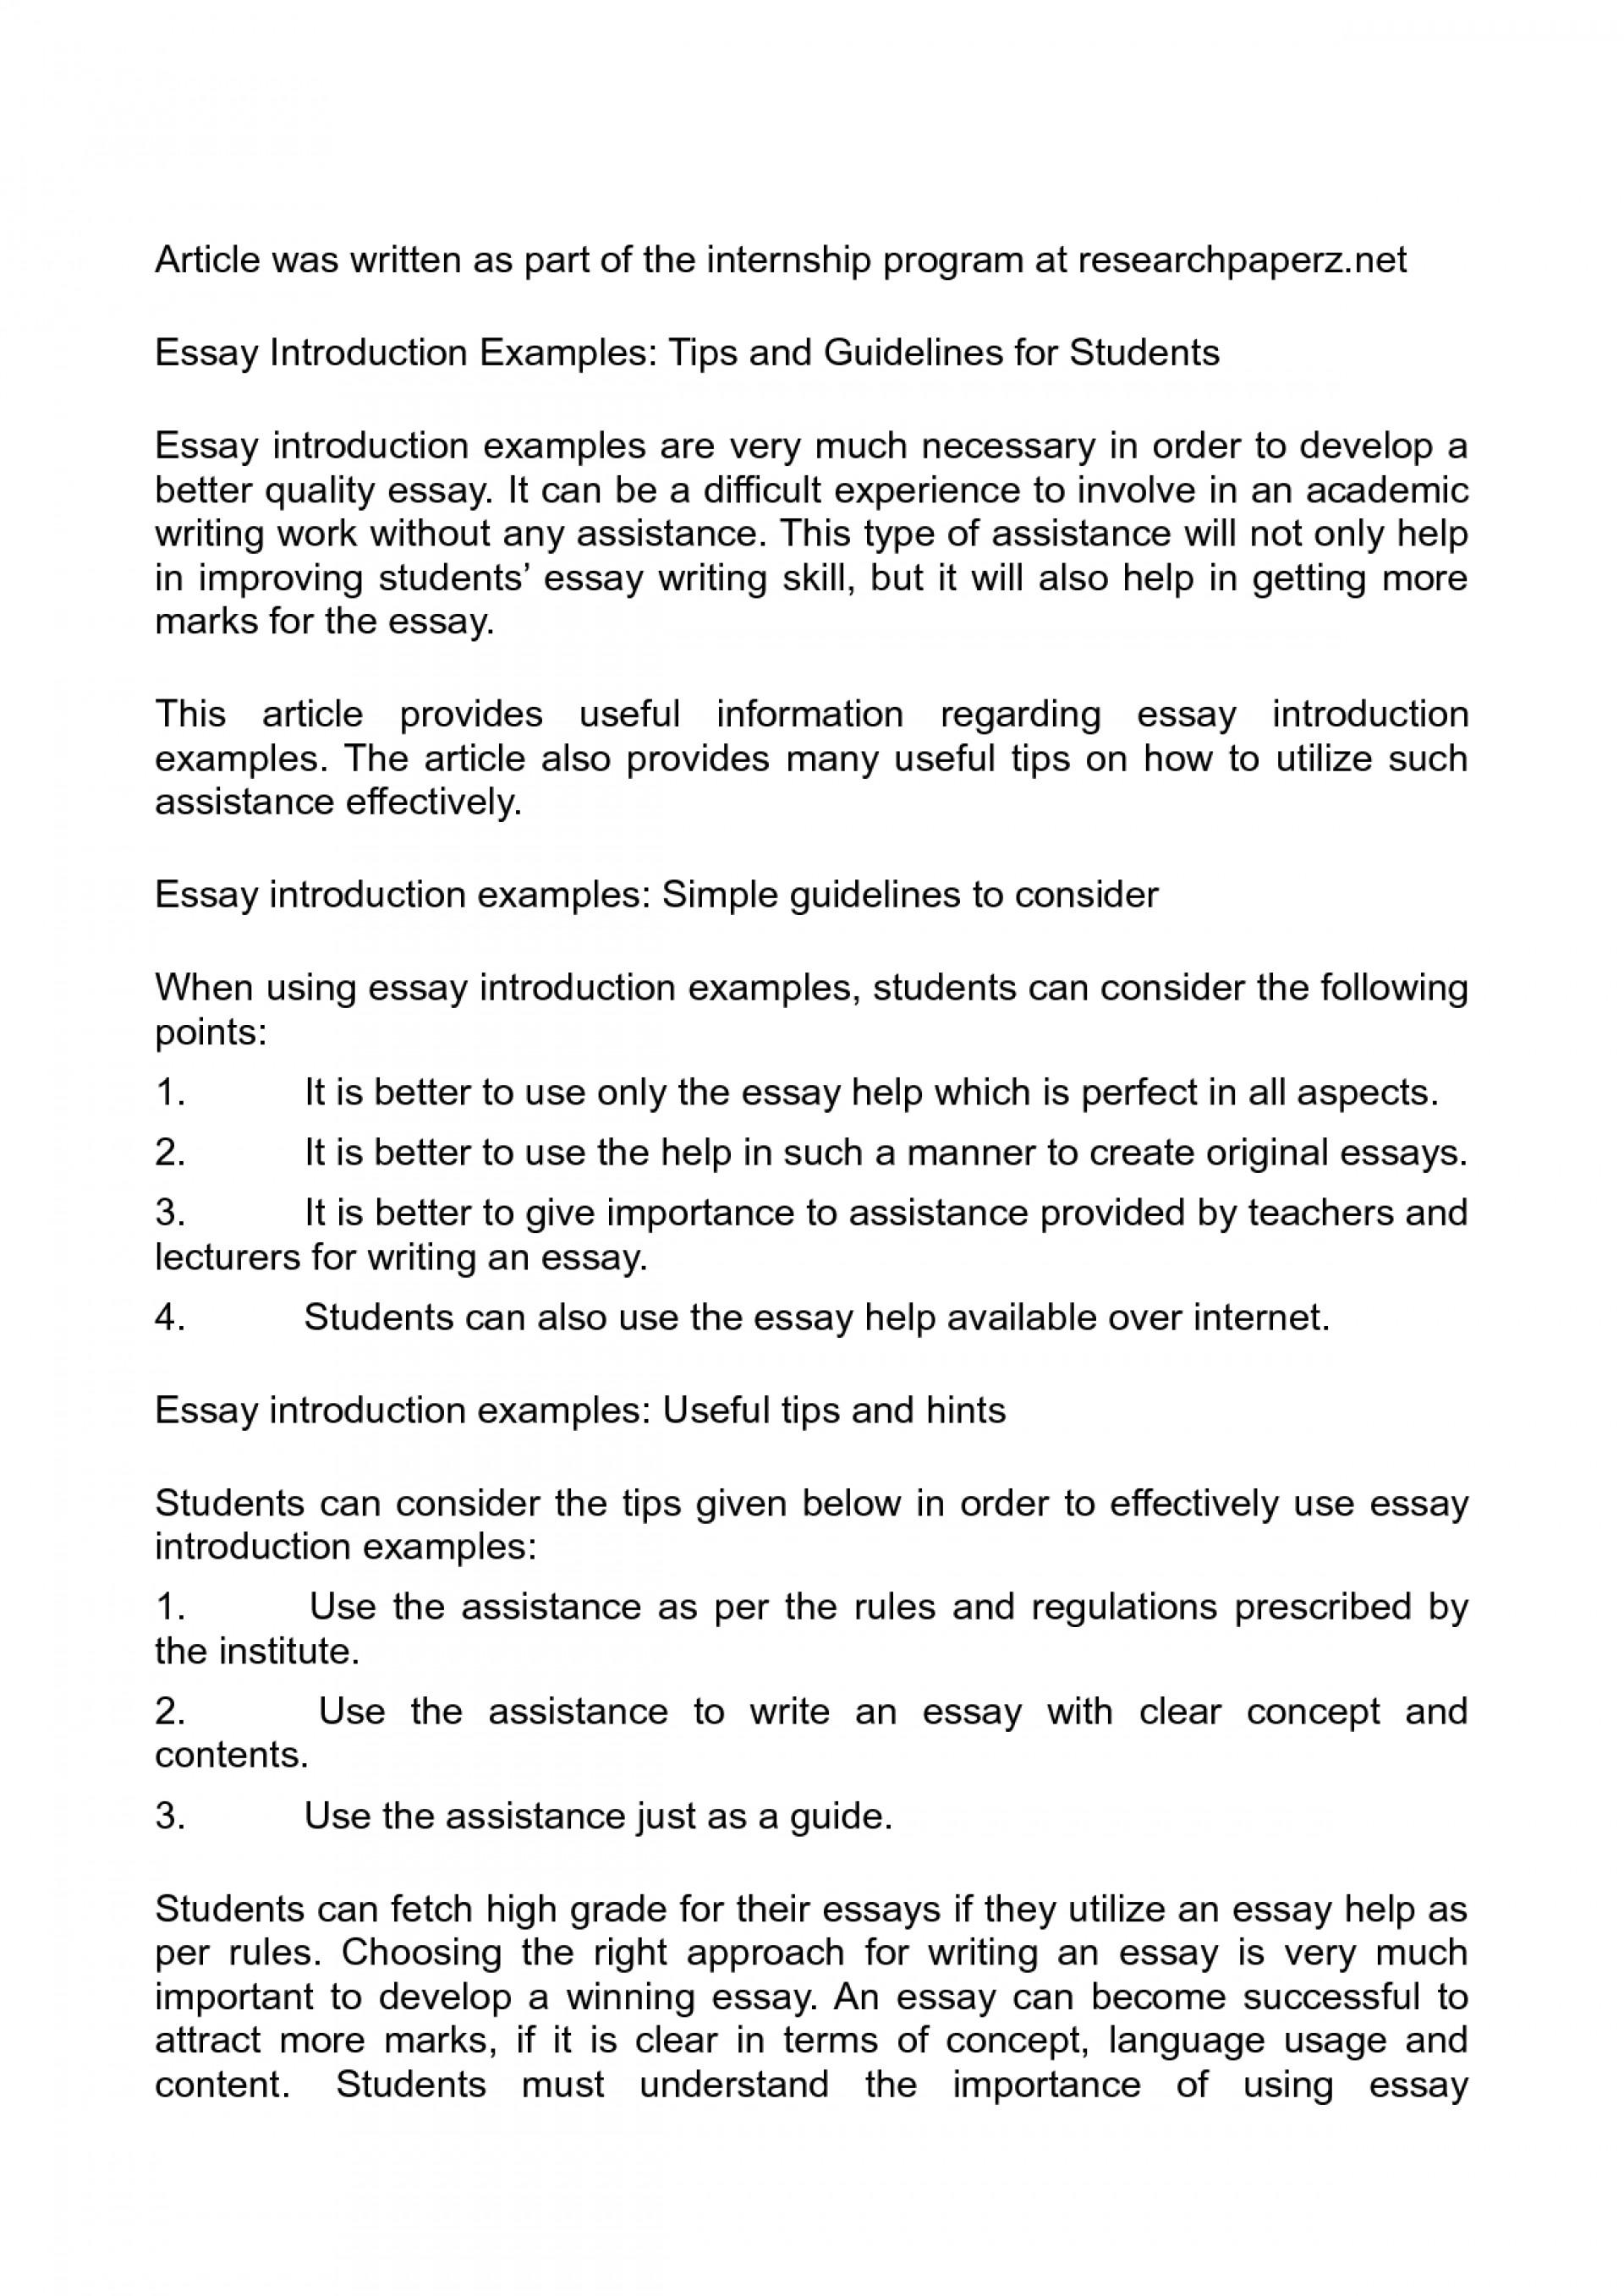 009 tp1 3 essay hook